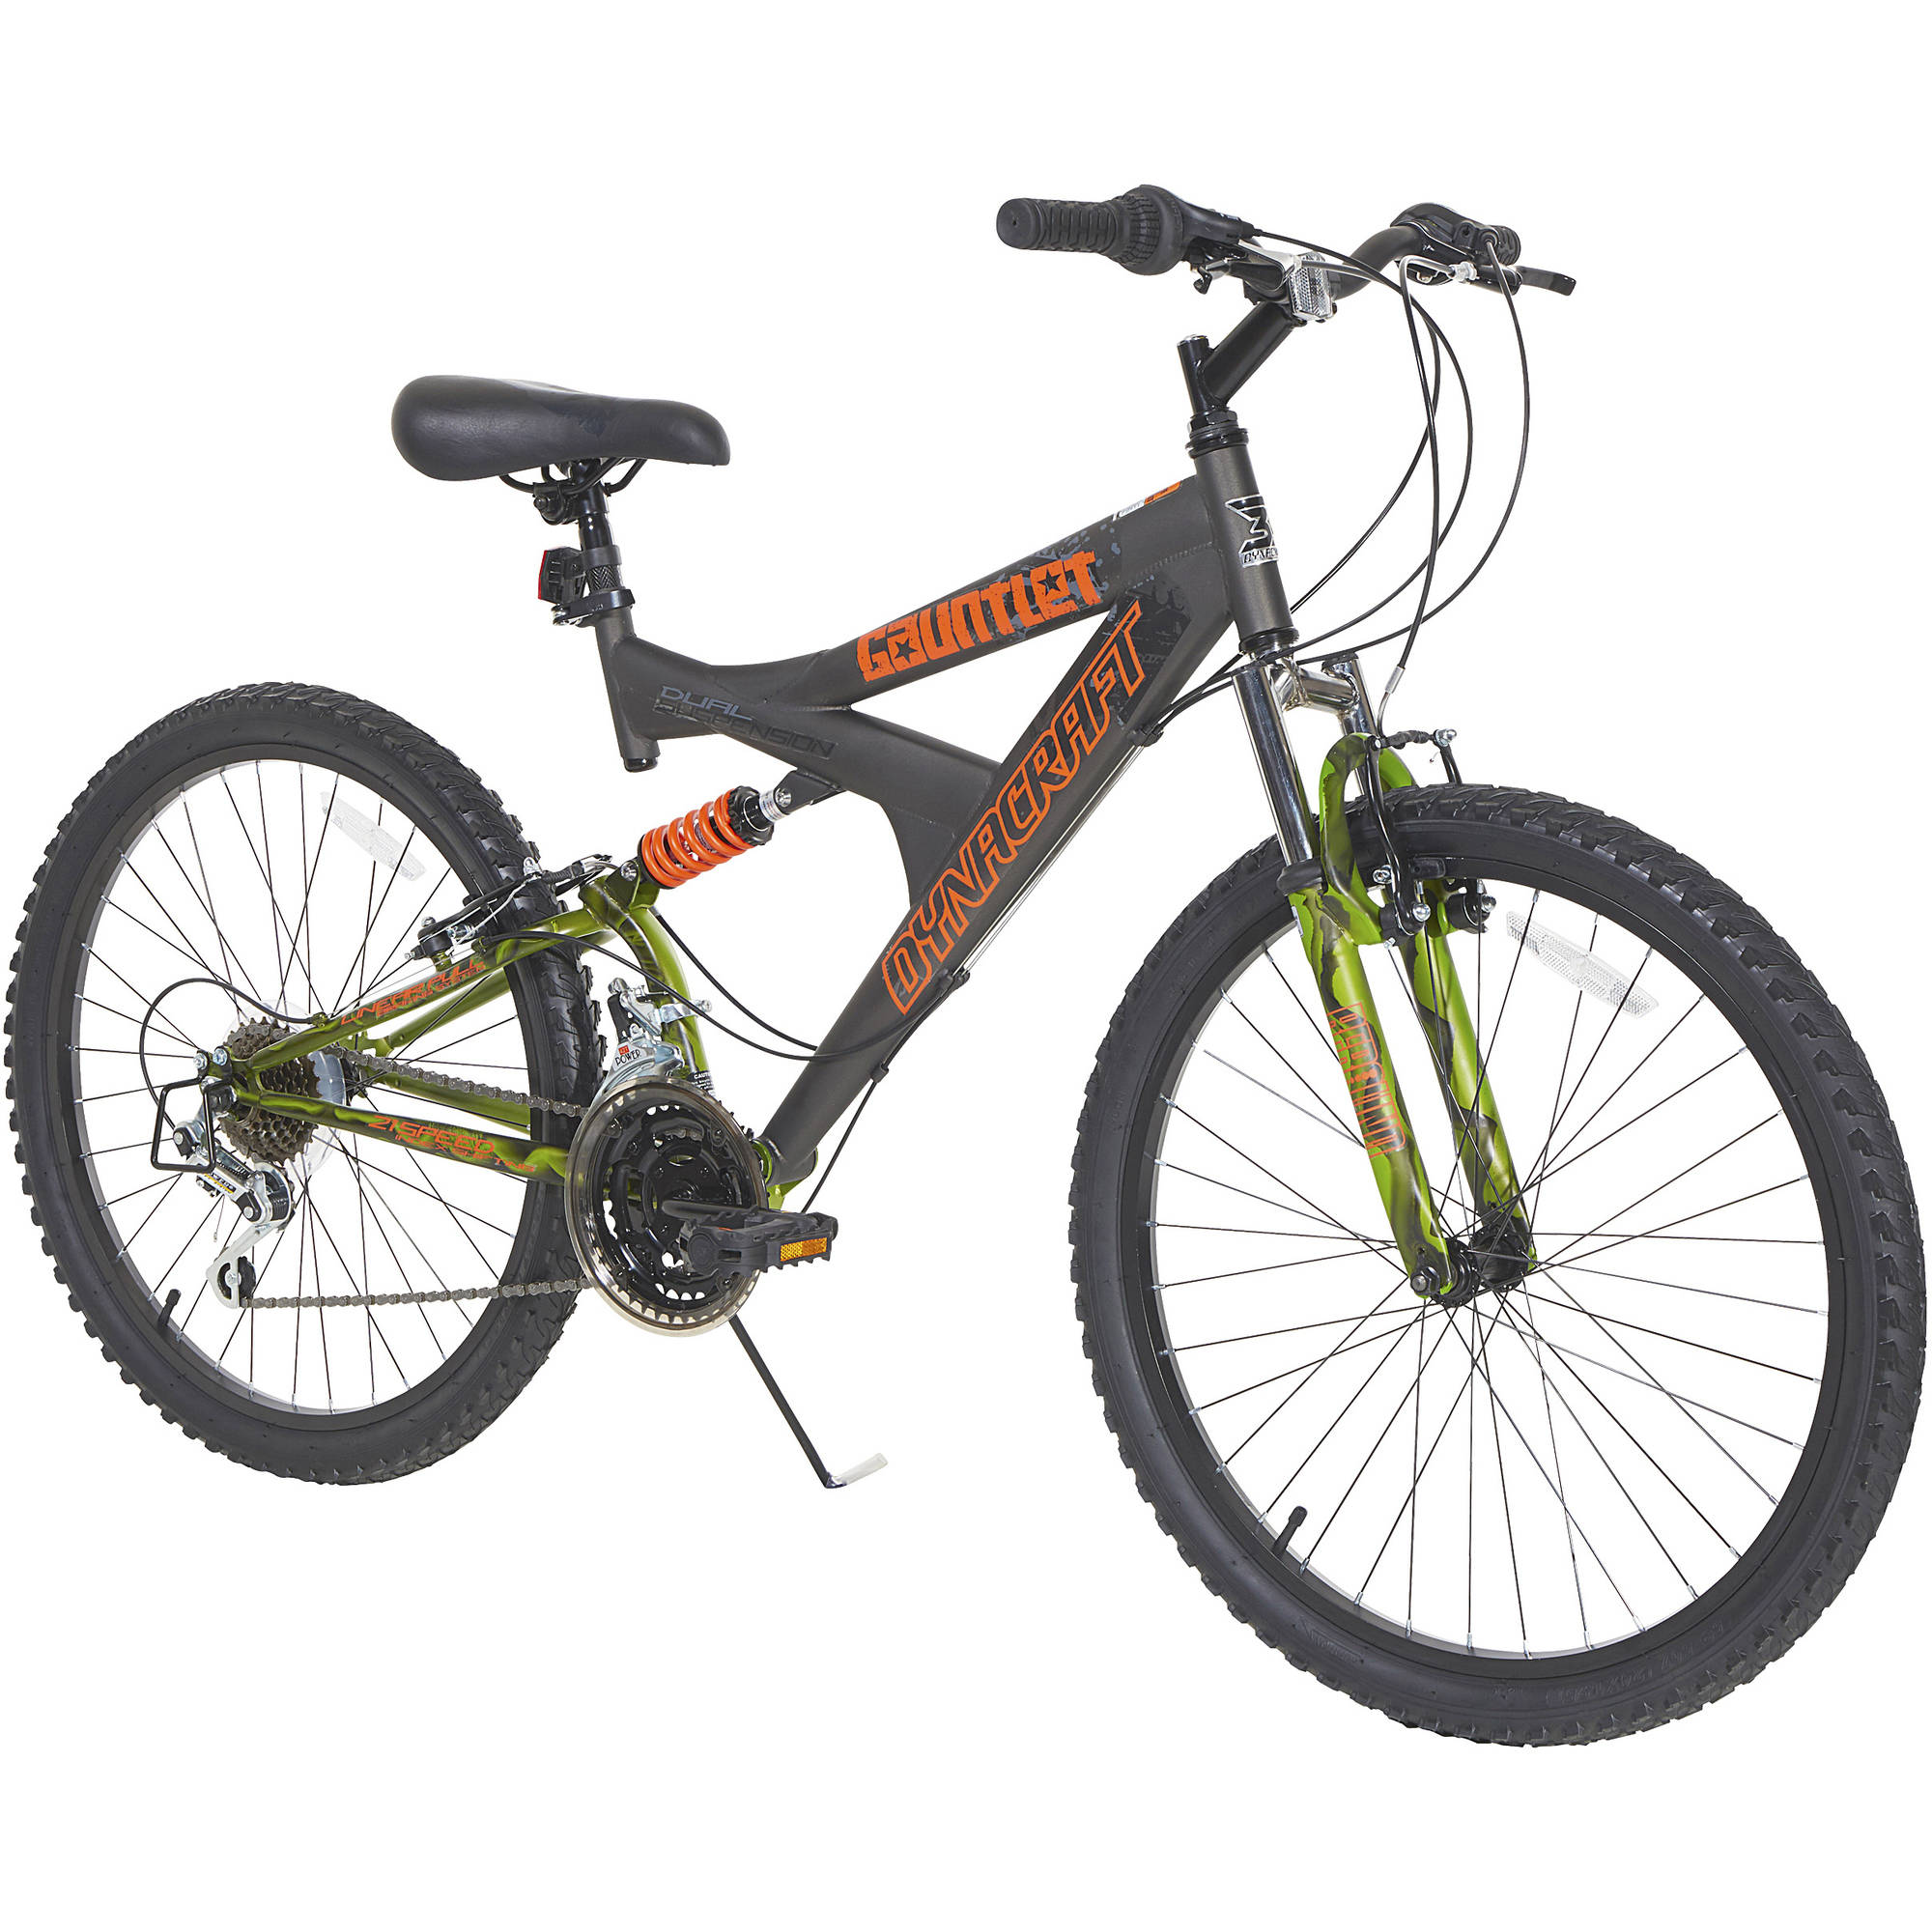 "24"" Dynacraft Gauntlet Boys' Mountain Bike"